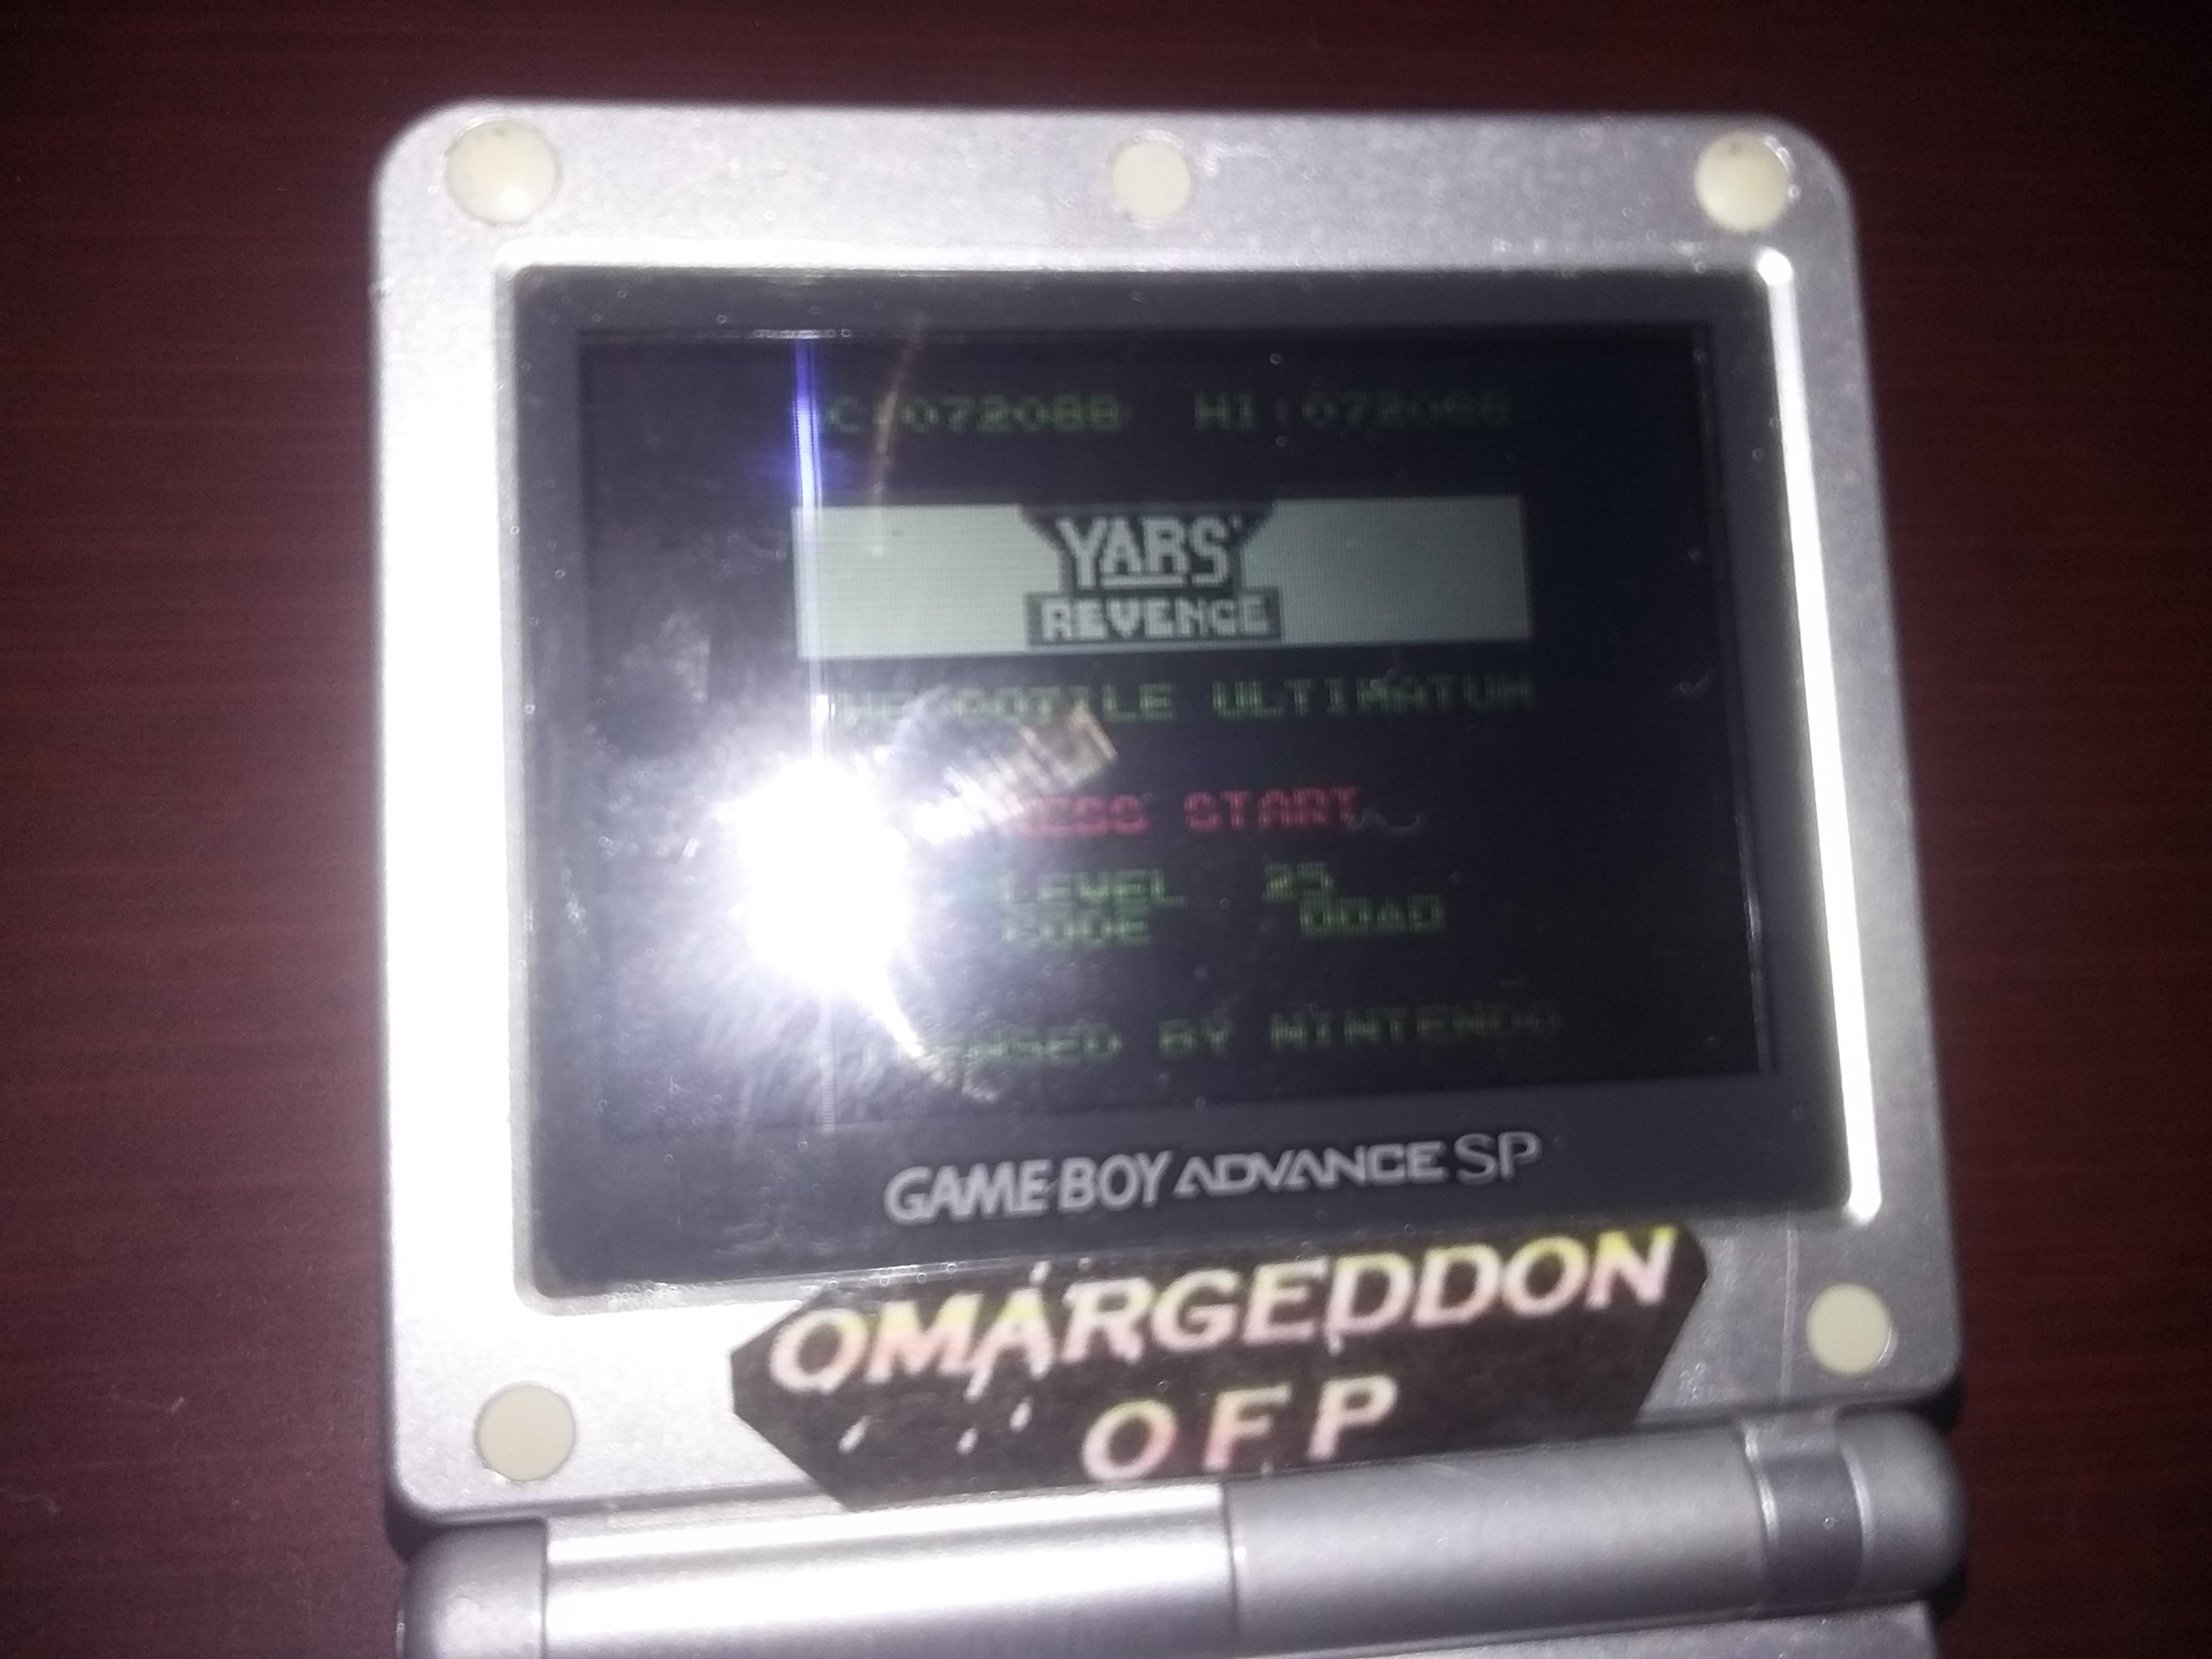 omargeddon: Yars